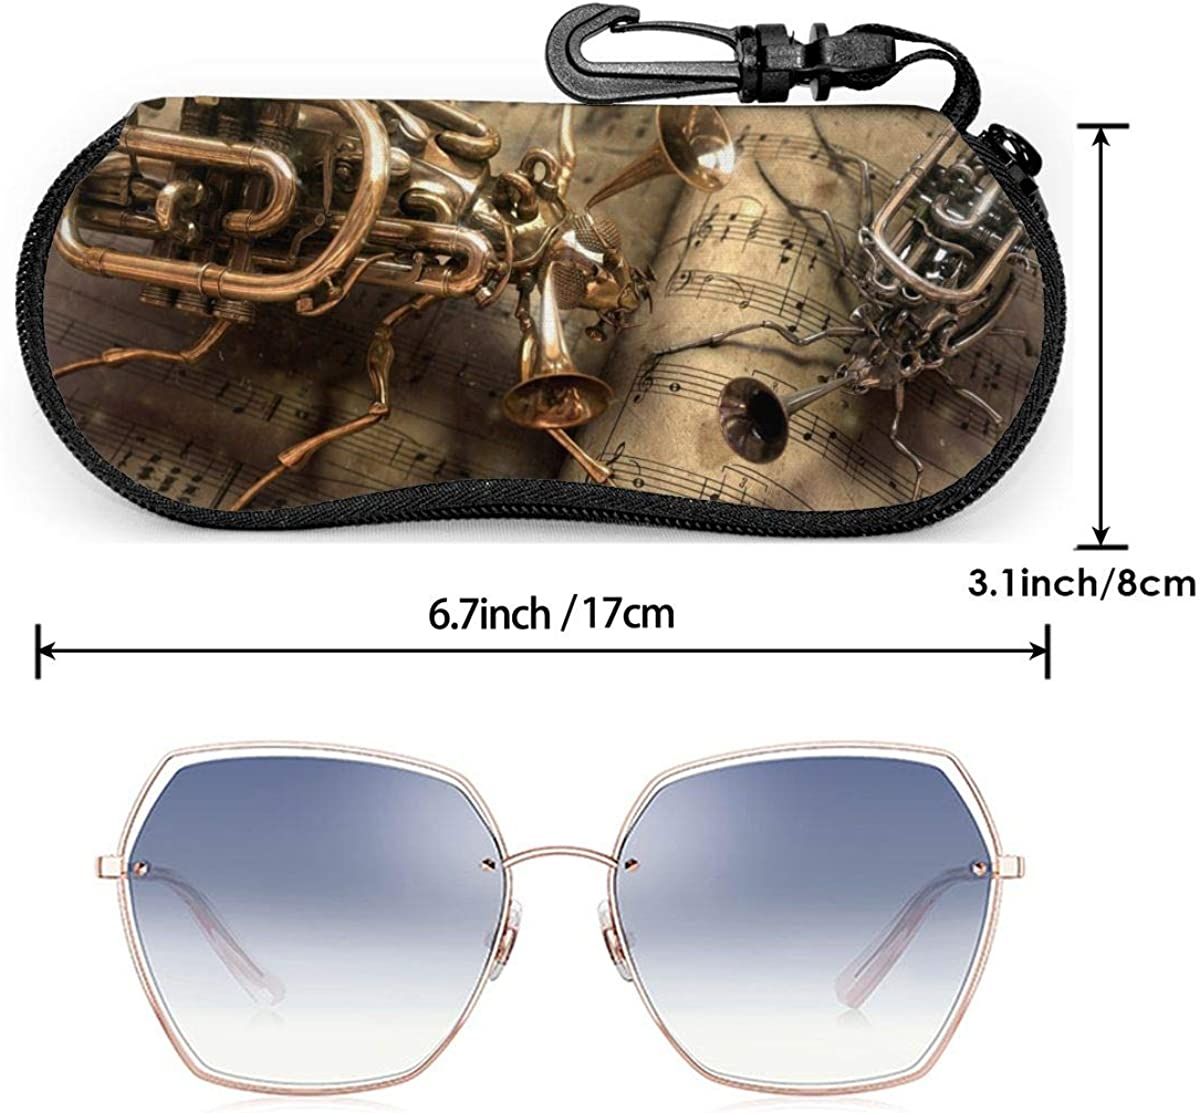 Soft Sunglasses Case With Carabiner Keychain Astronaut Pattern Ultra Light Portable Neoprene Zipper Eyeglass Bag